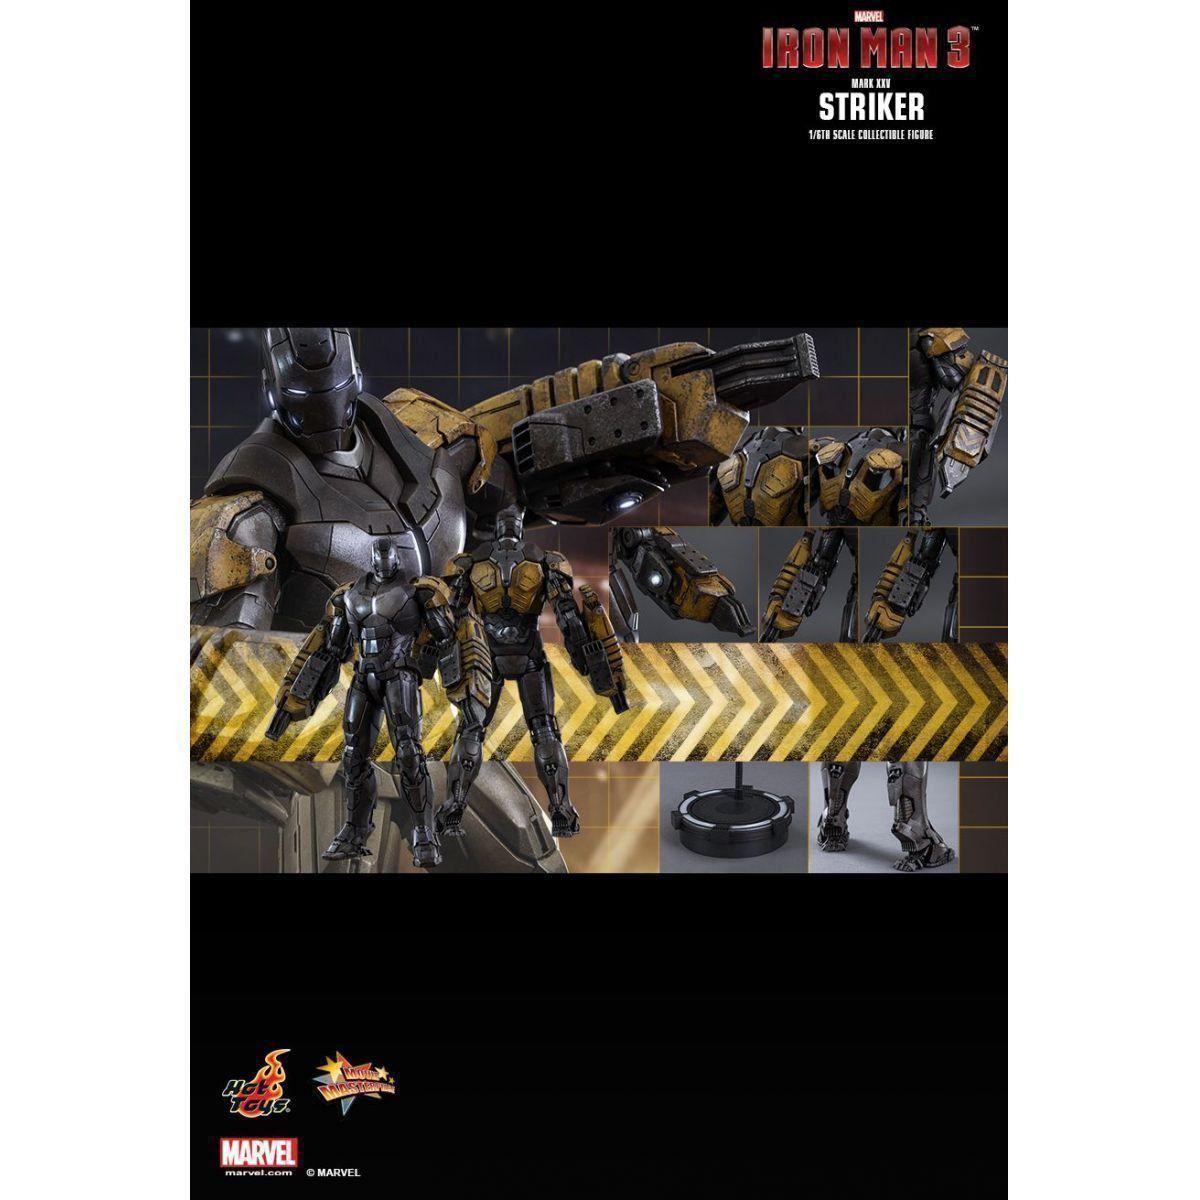 Action Figure Homem de Ferro (Iron Man) (Mark XXV) (Striker): Homem de Ferro 3 (Iron Man 3) Escala 1/6 (MMS332) - Hot Toys